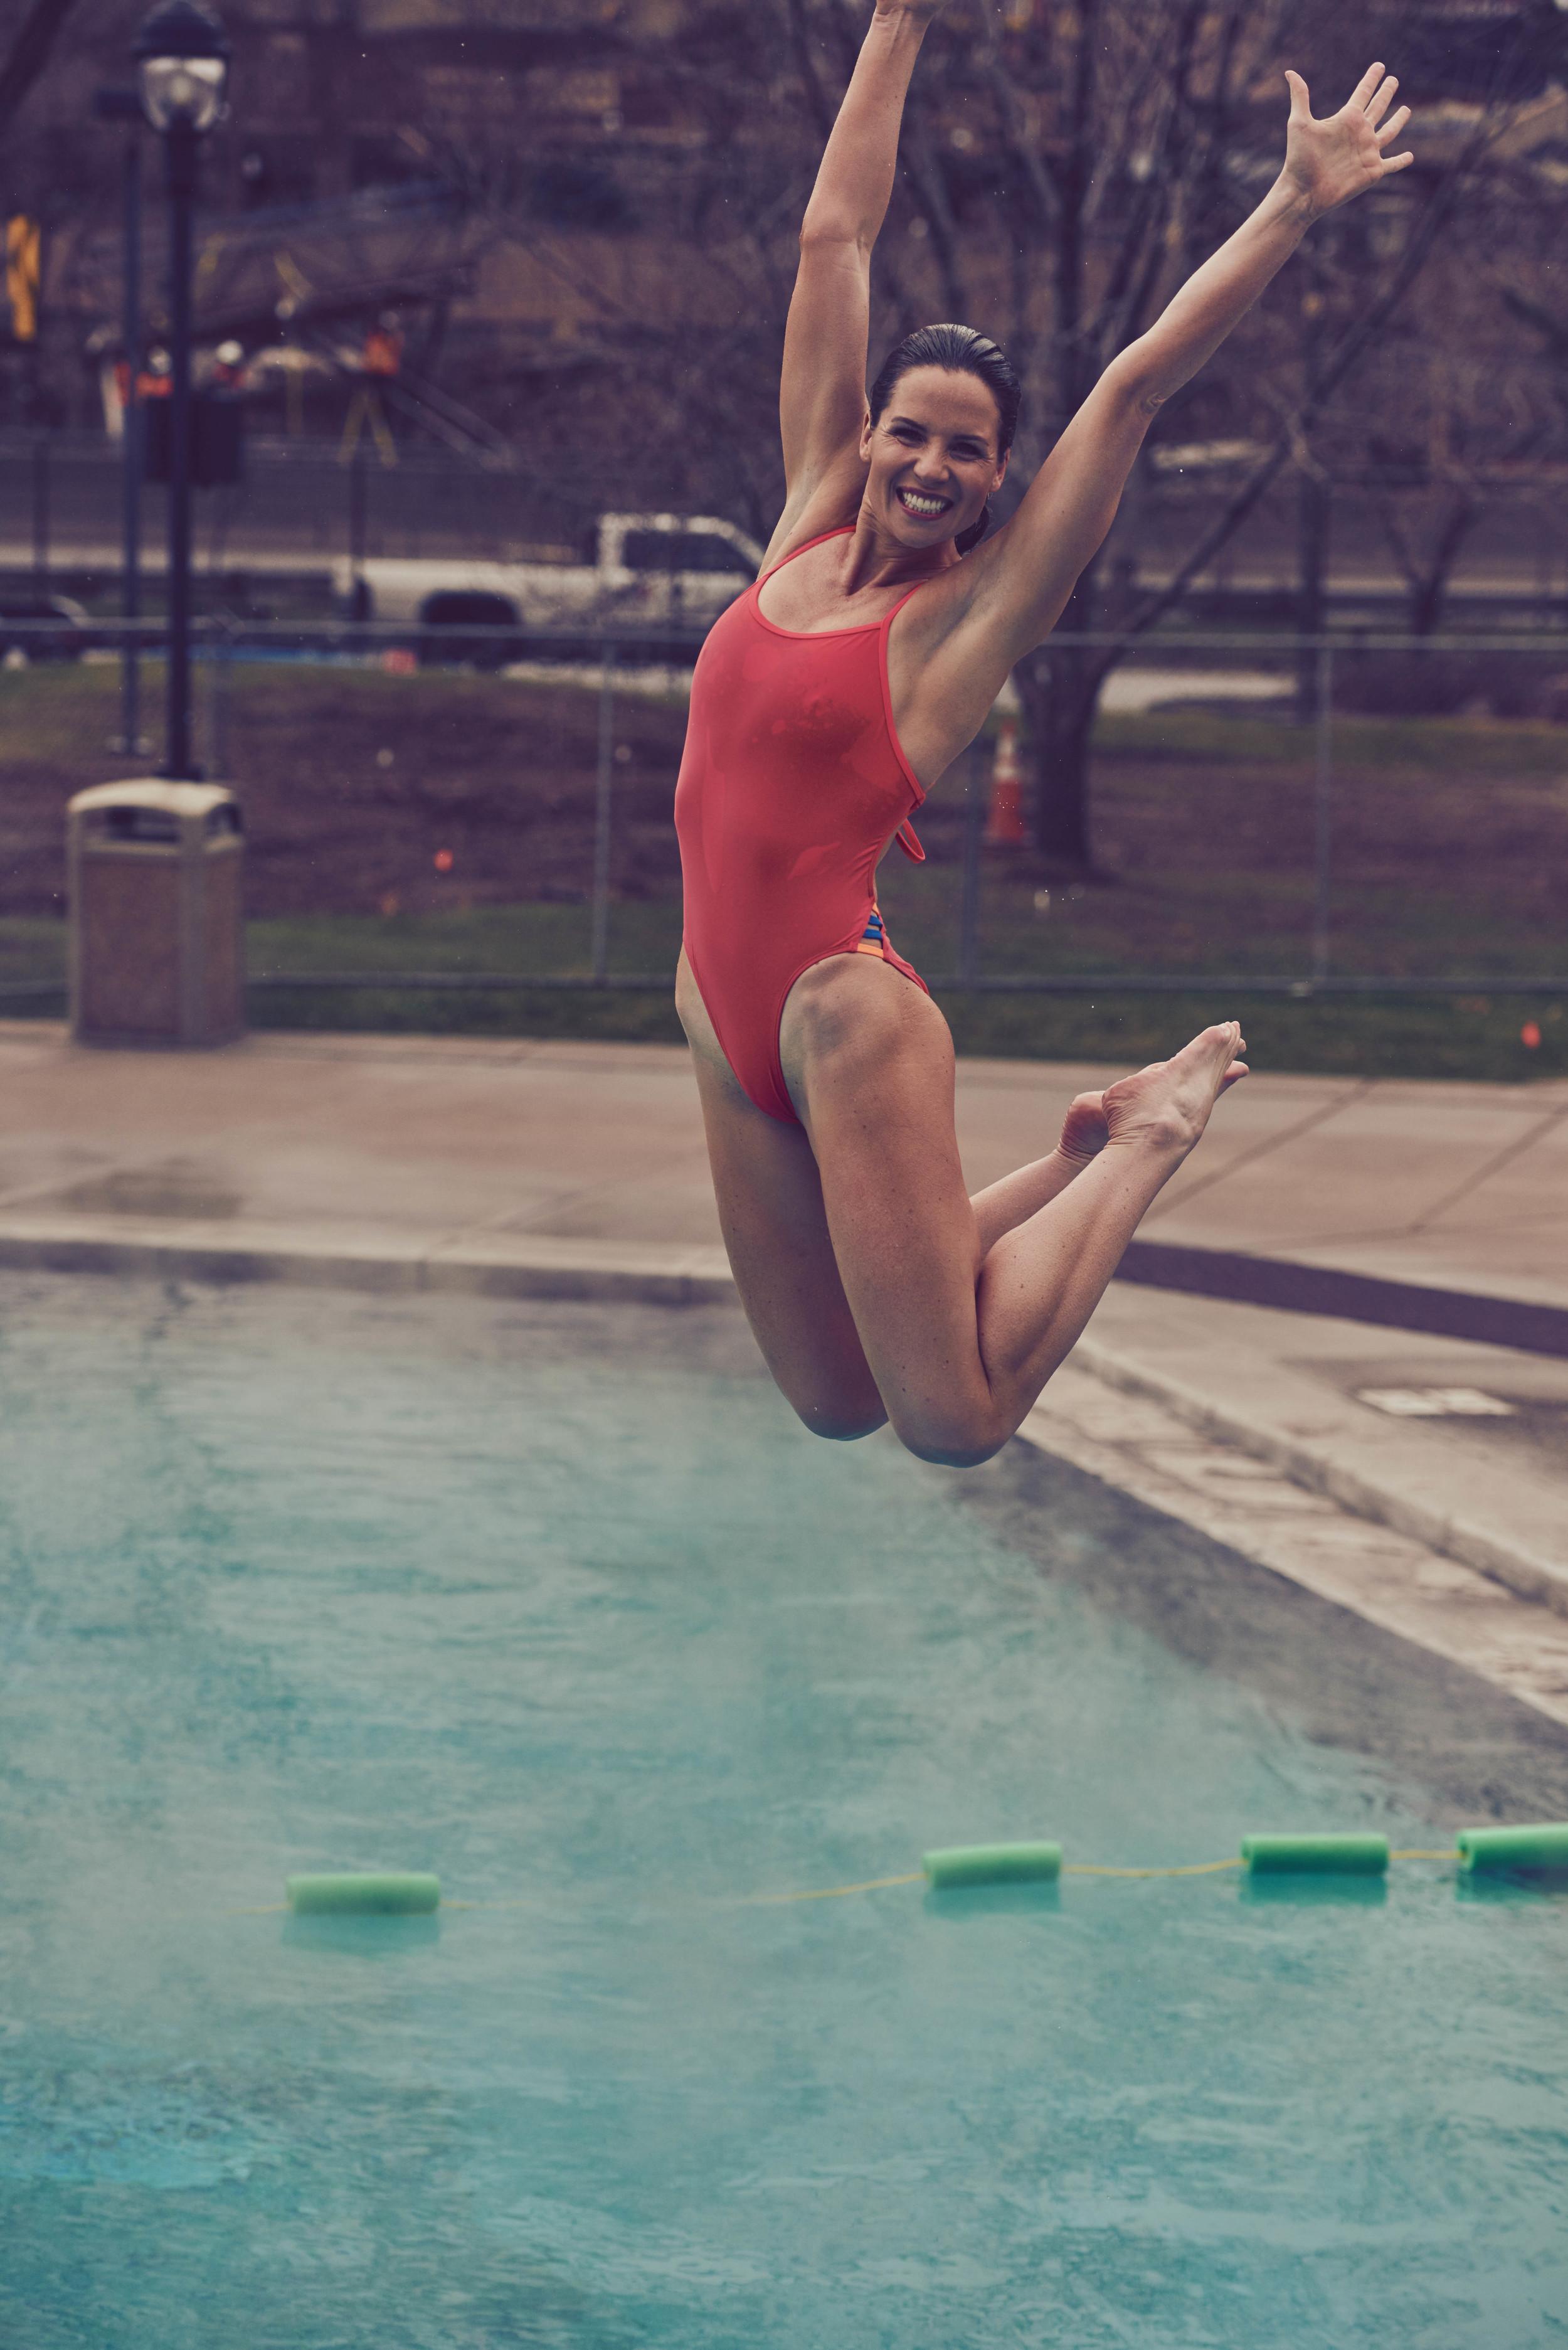 Diving board jump 1.jpg